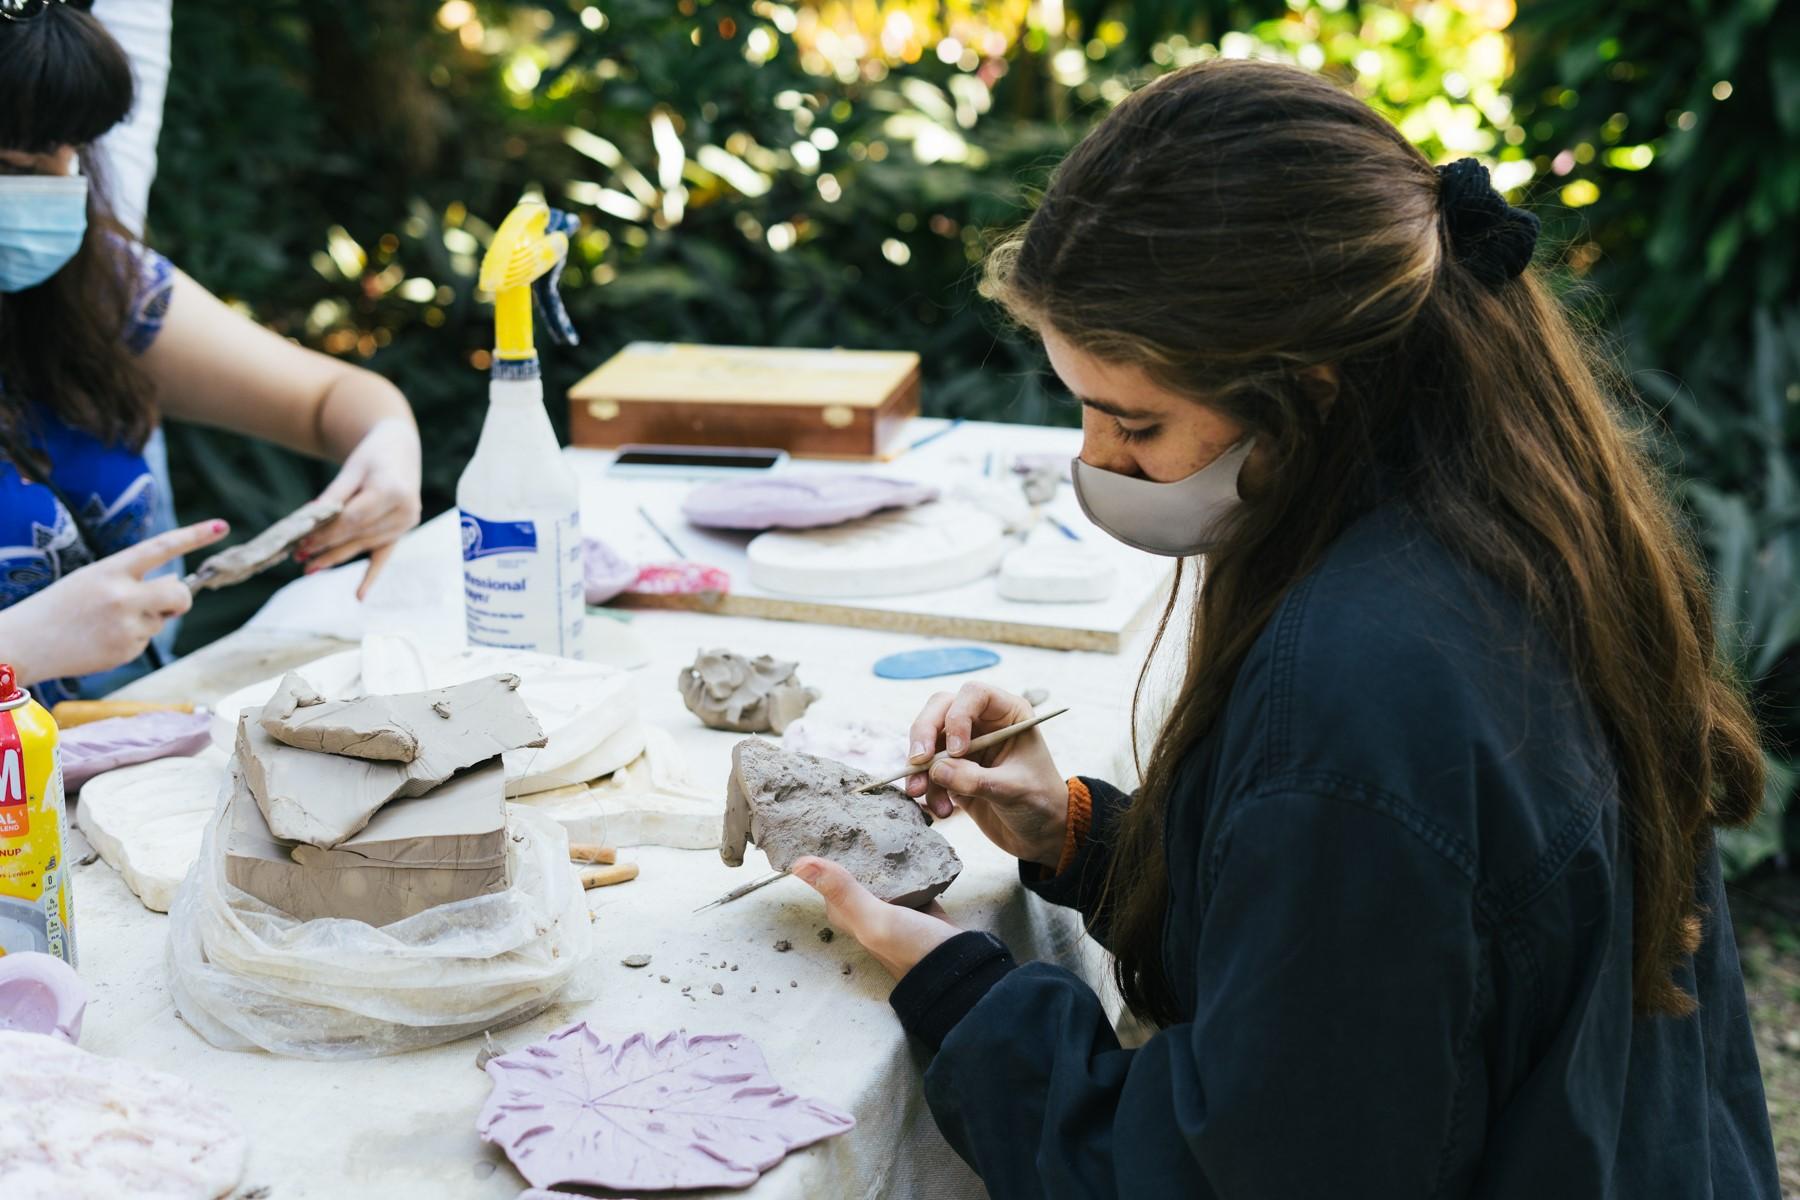 Student participating in Lauren Shapiro's community sculpting class